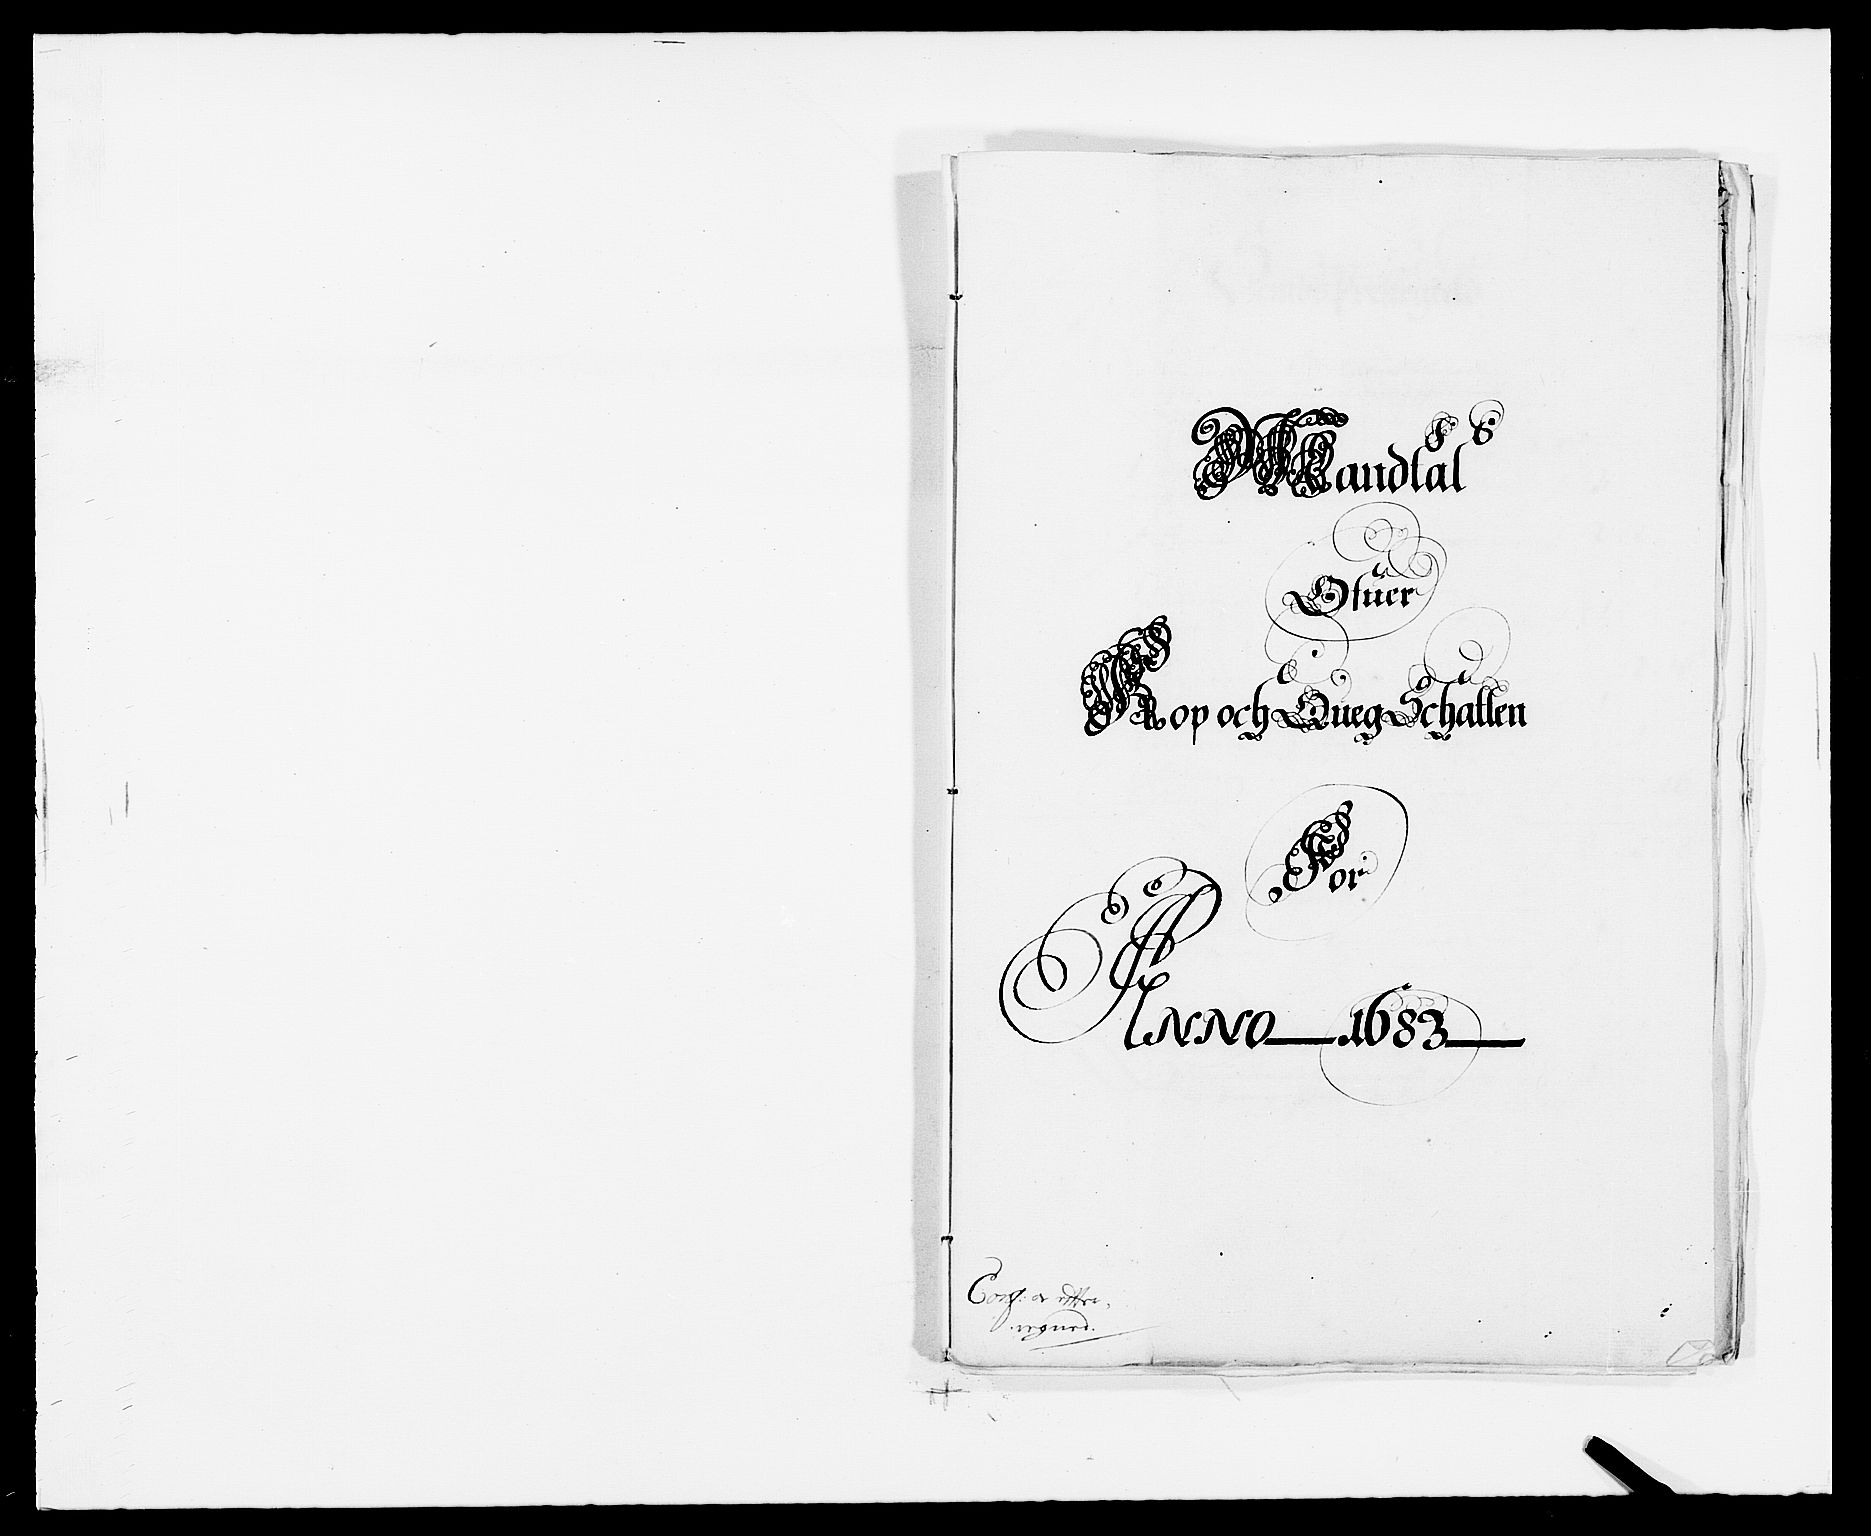 RA, Rentekammeret inntil 1814, Reviderte regnskaper, Fogderegnskap, R32/L1853: Fogderegnskap Jarlsberg grevskap, 1683, s. 149